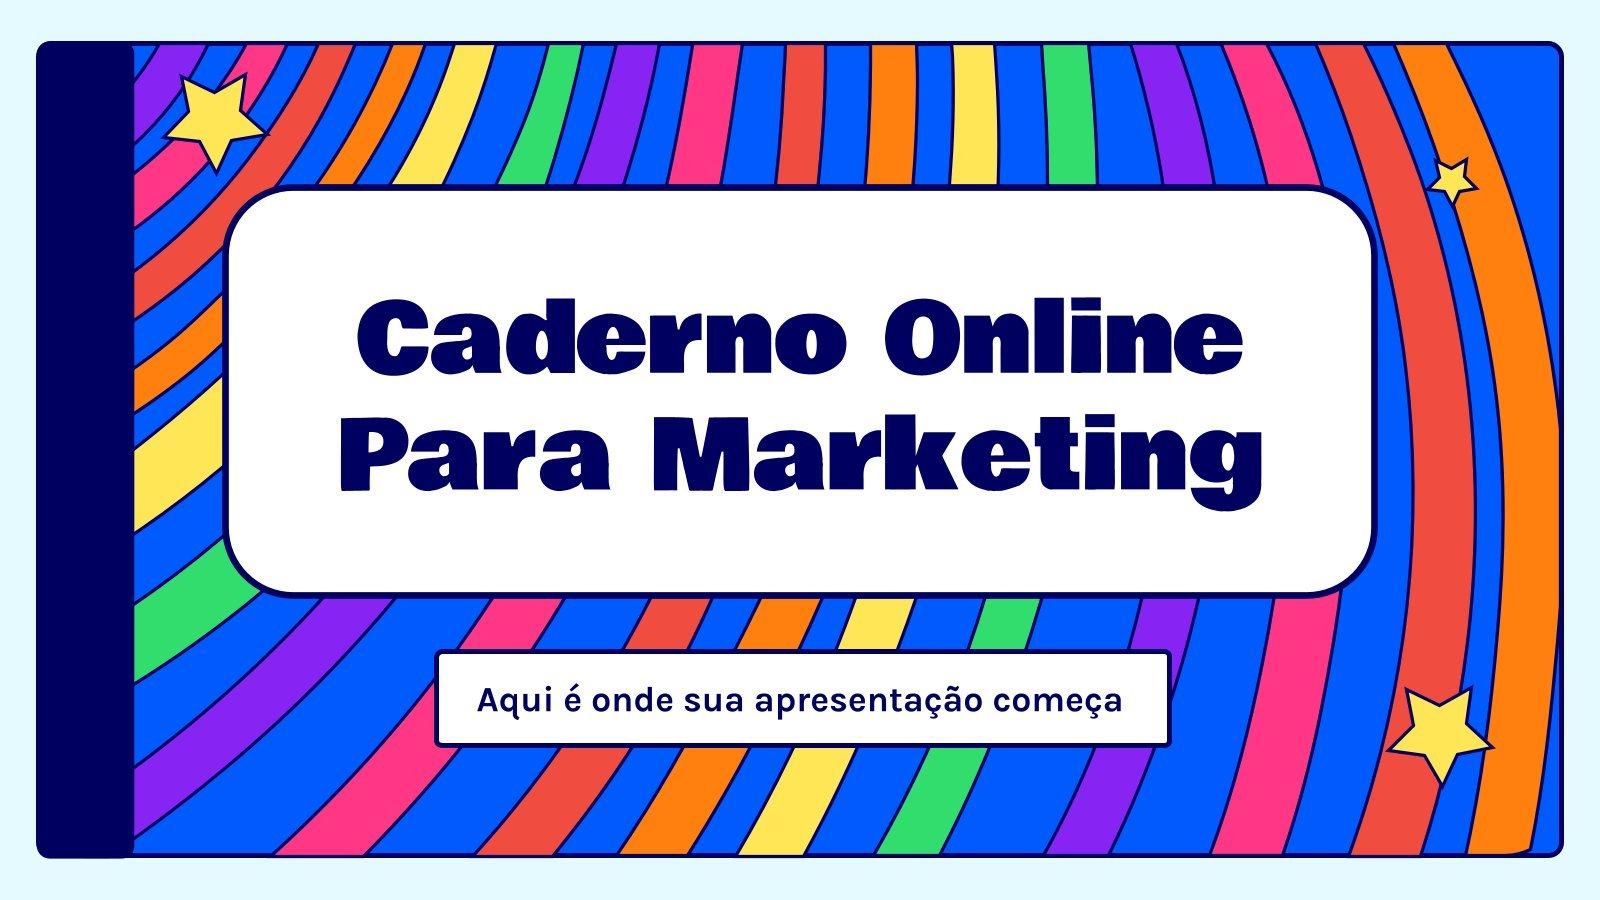 Caderno Online para Marketing presentation template